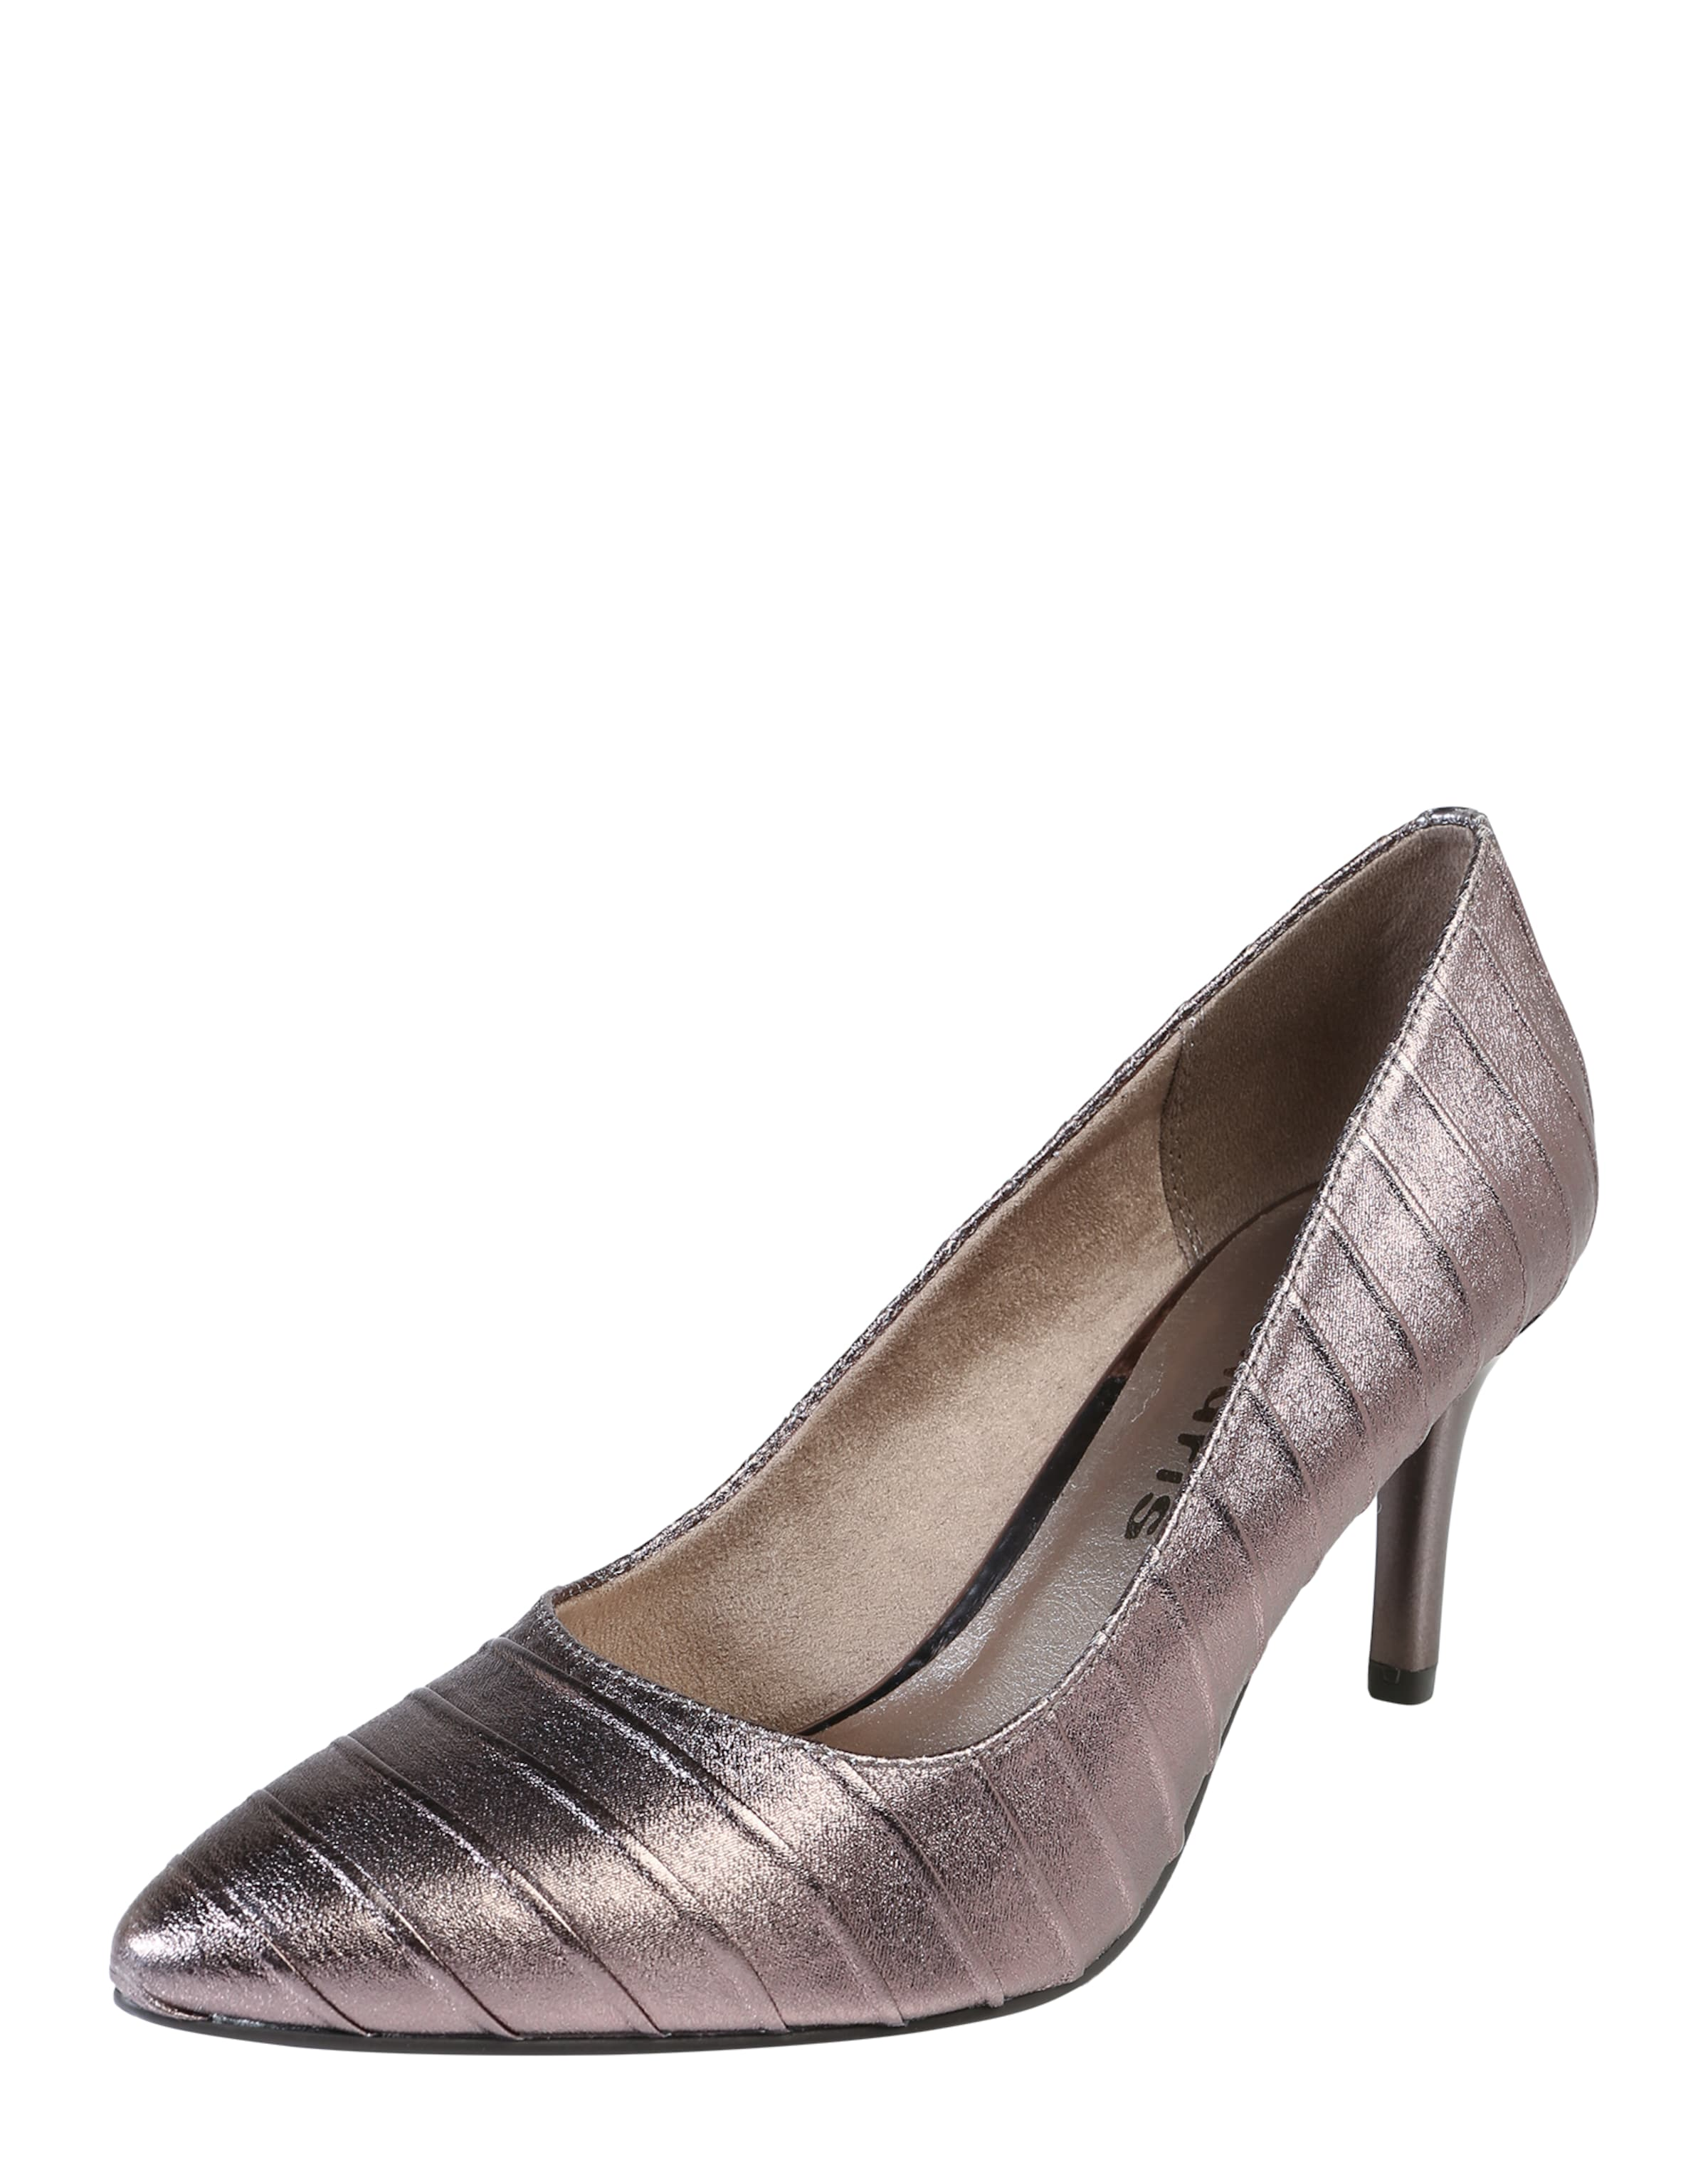 TAMARIS Pumps in Metallic-Optik Günstige und langlebige Schuhe